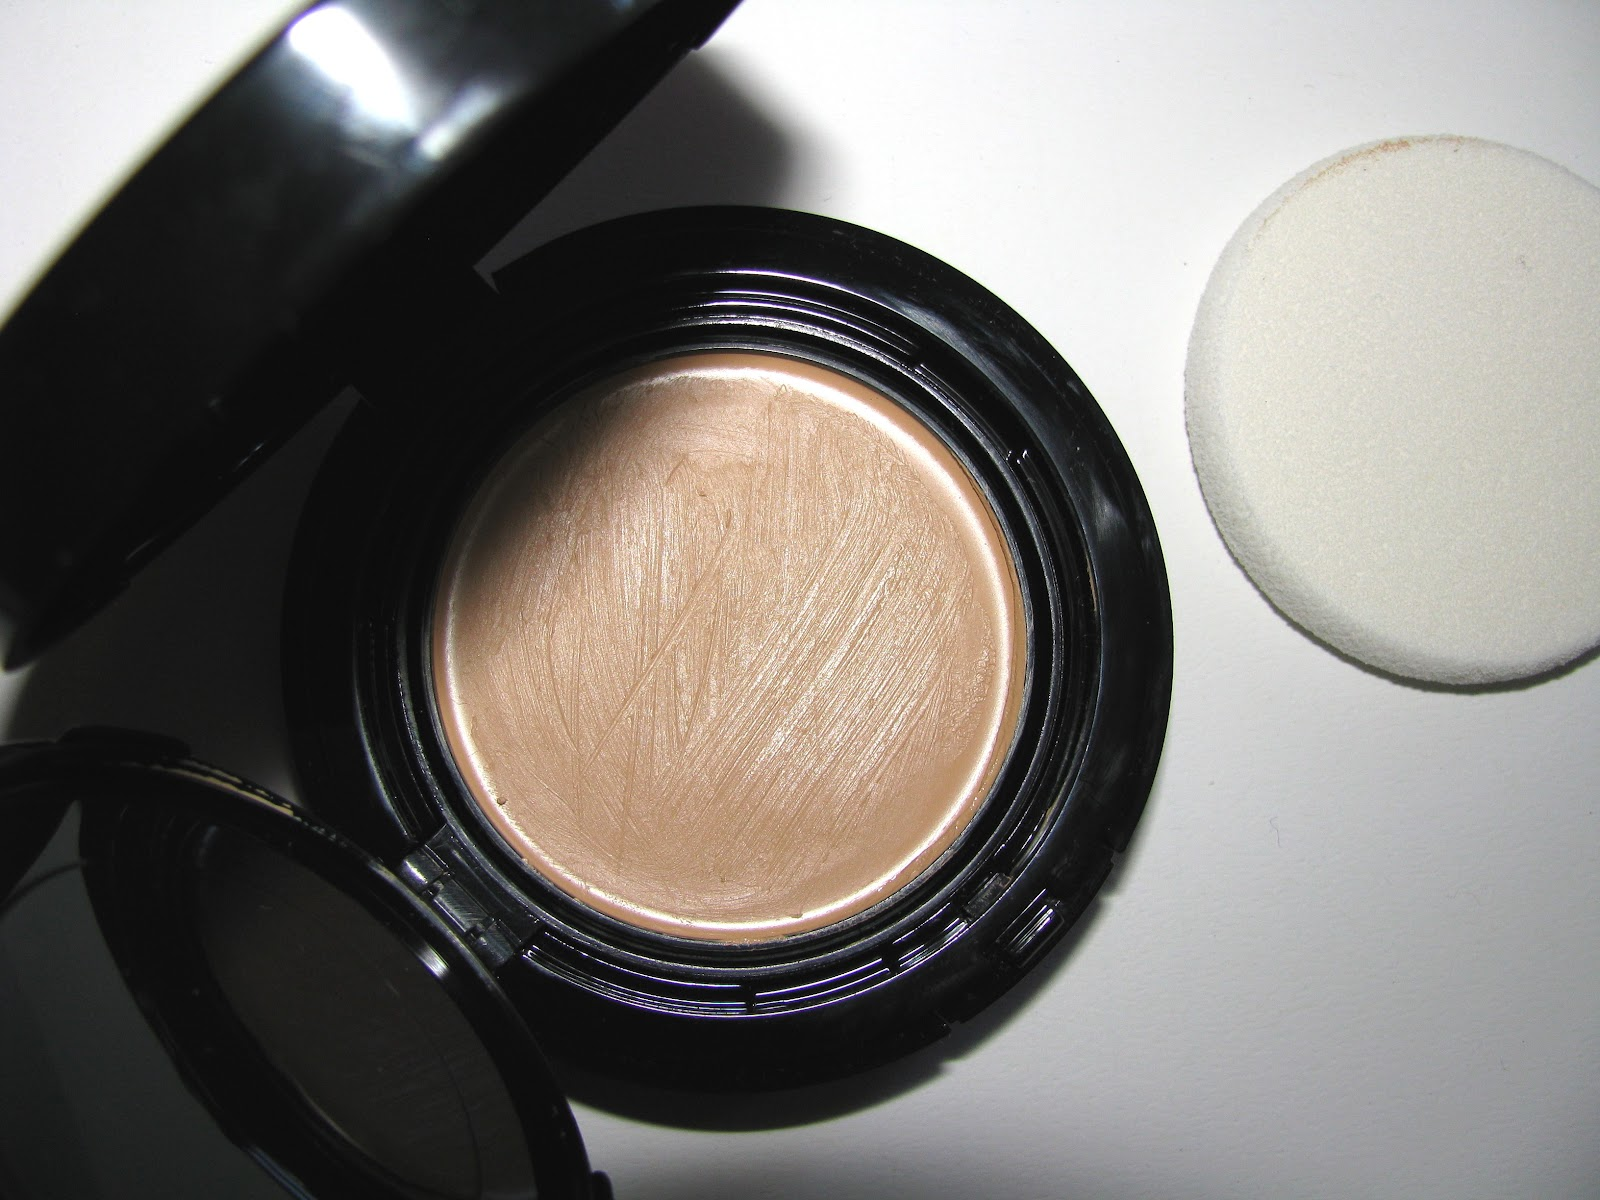 the beauty alchemist chanel vitalumiere aqua cream compact makeup. Black Bedroom Furniture Sets. Home Design Ideas